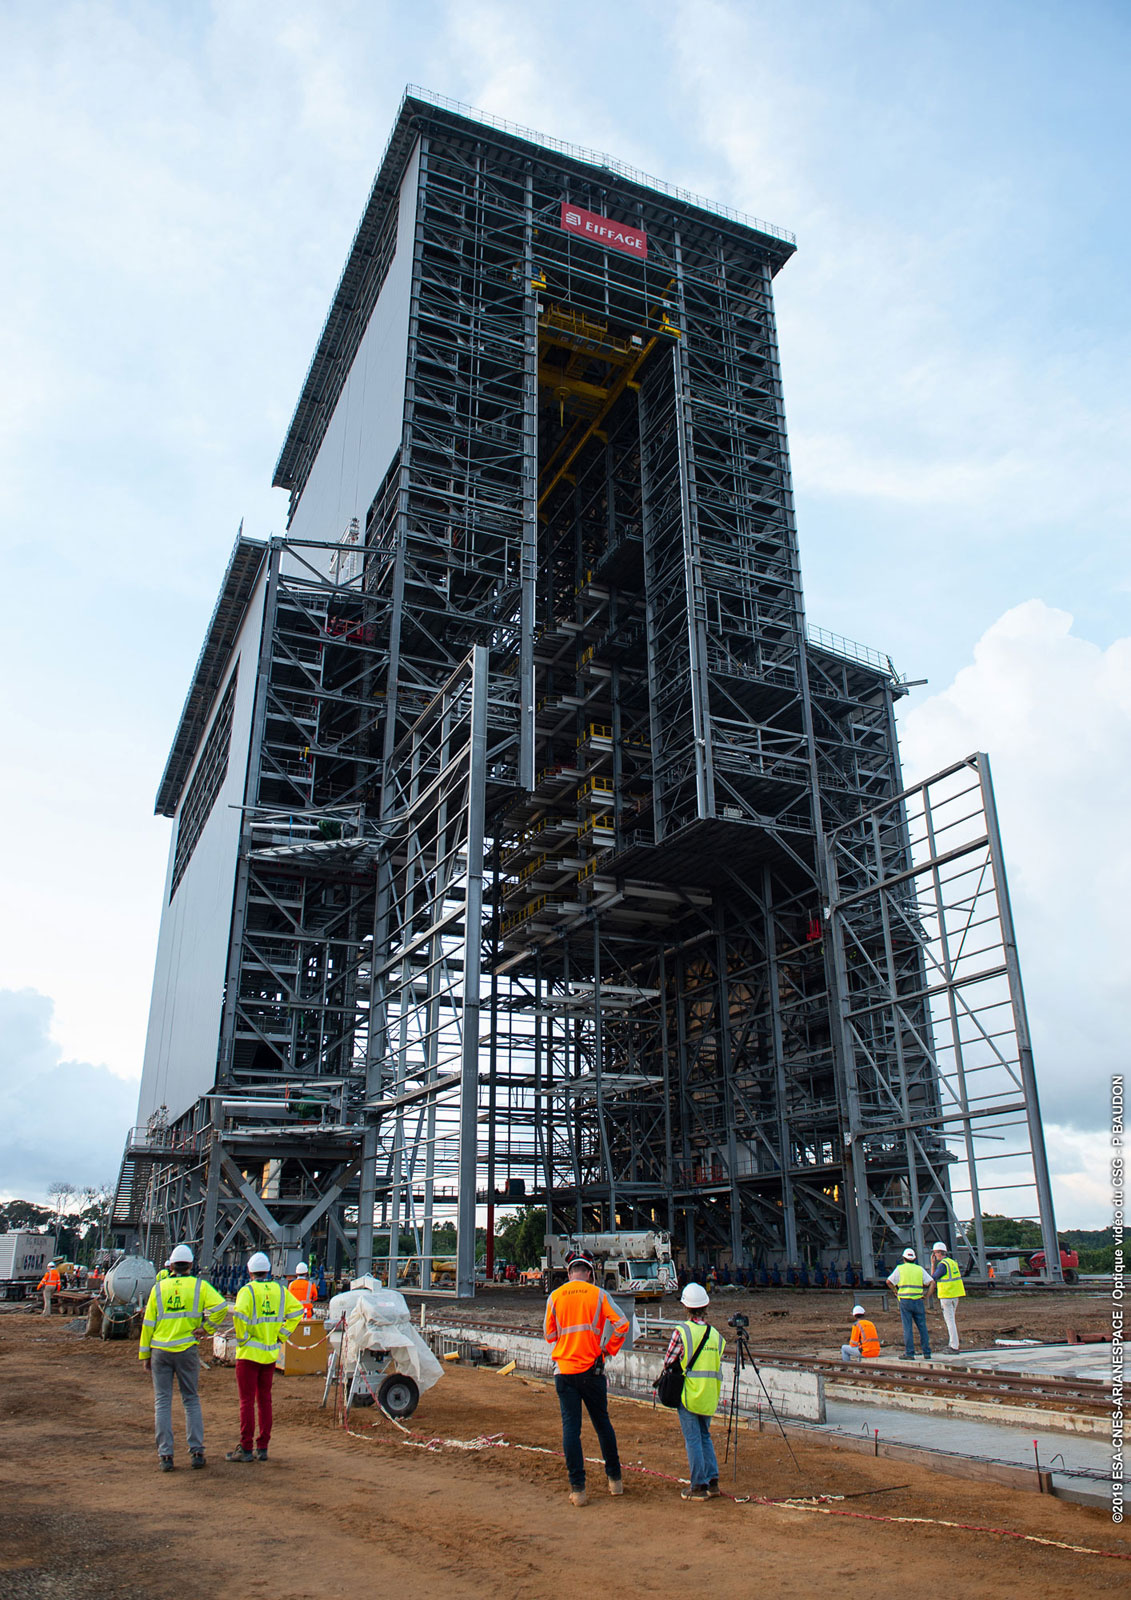 Obslužná věž Ariane 6 během stavby.